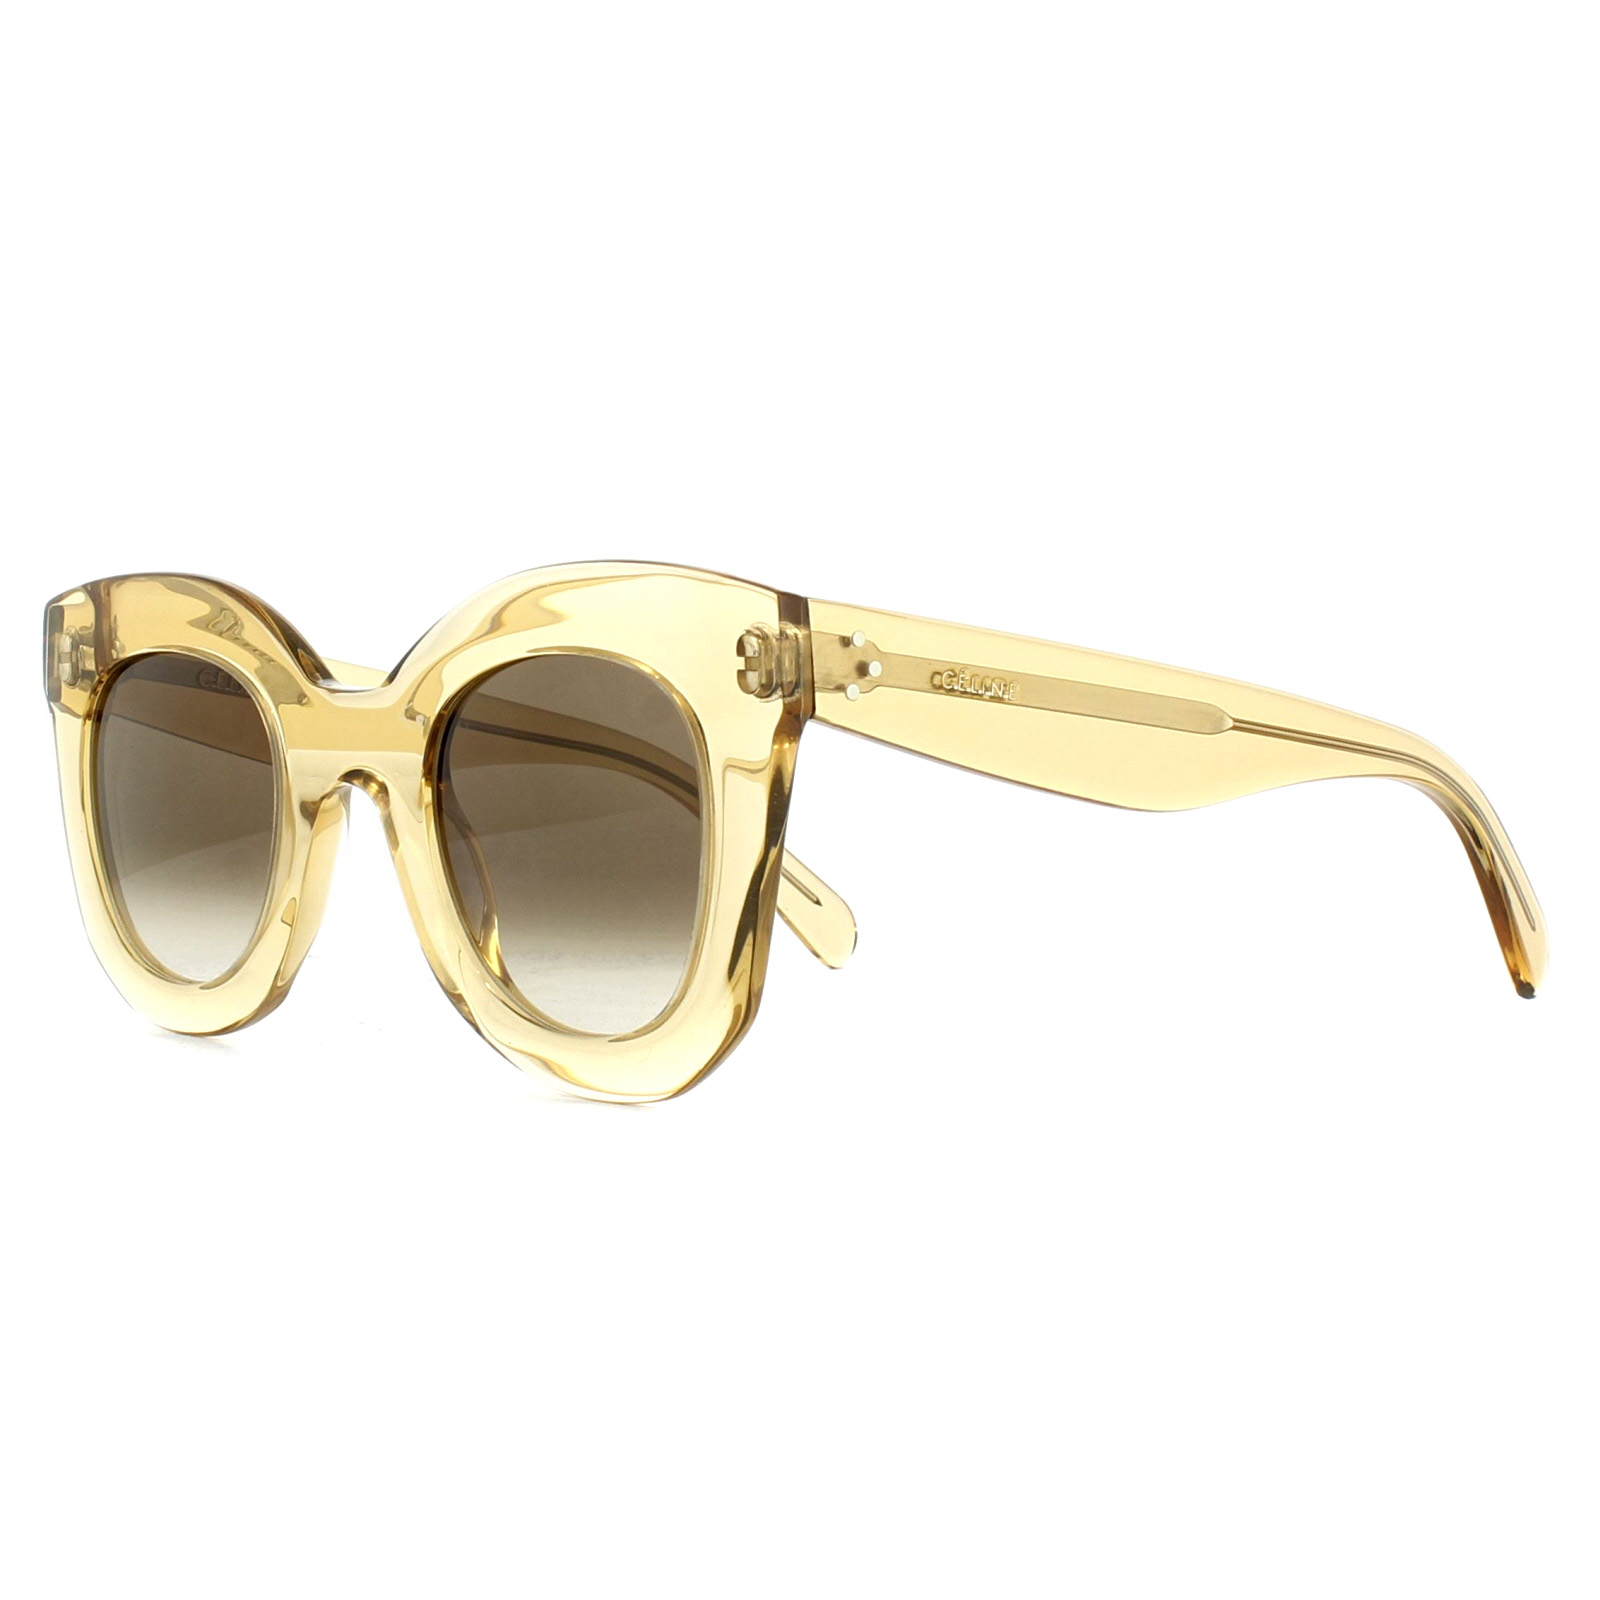 87380ab478 Sentinel Celine Sunglasses 41393 S Baby Marta HAM X9 Clear Champagne Brown  Gradient